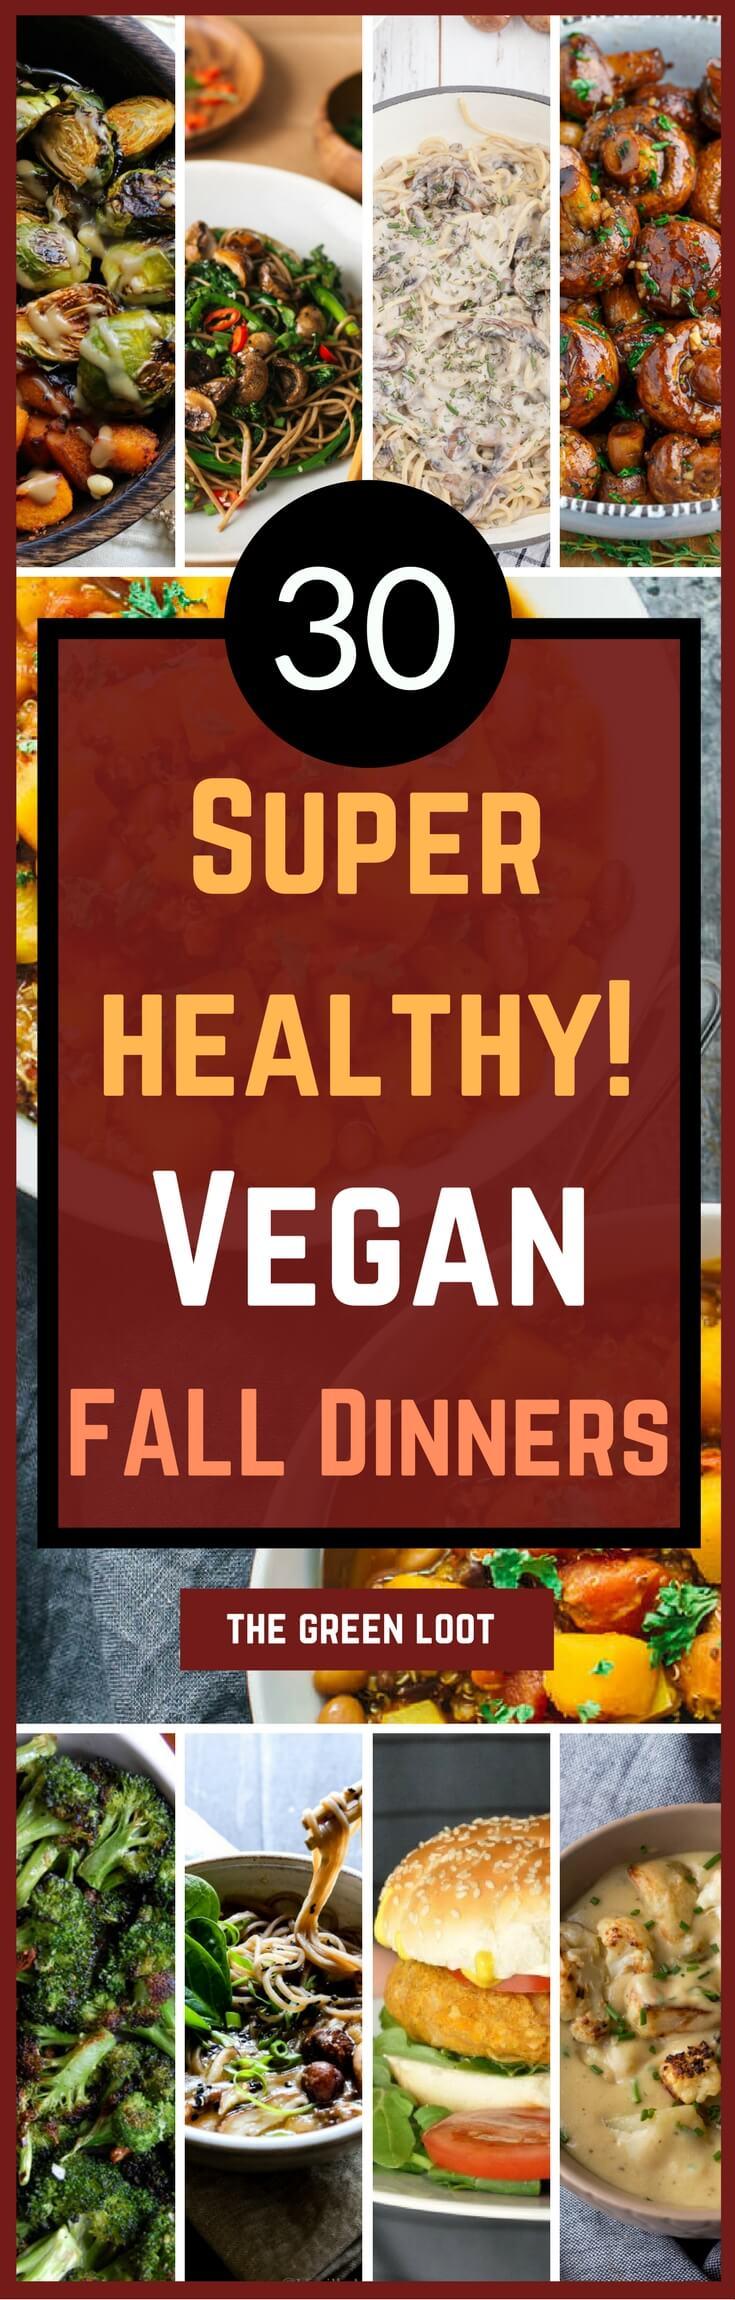 Healthy Vegan Fall Recipes for Dinner